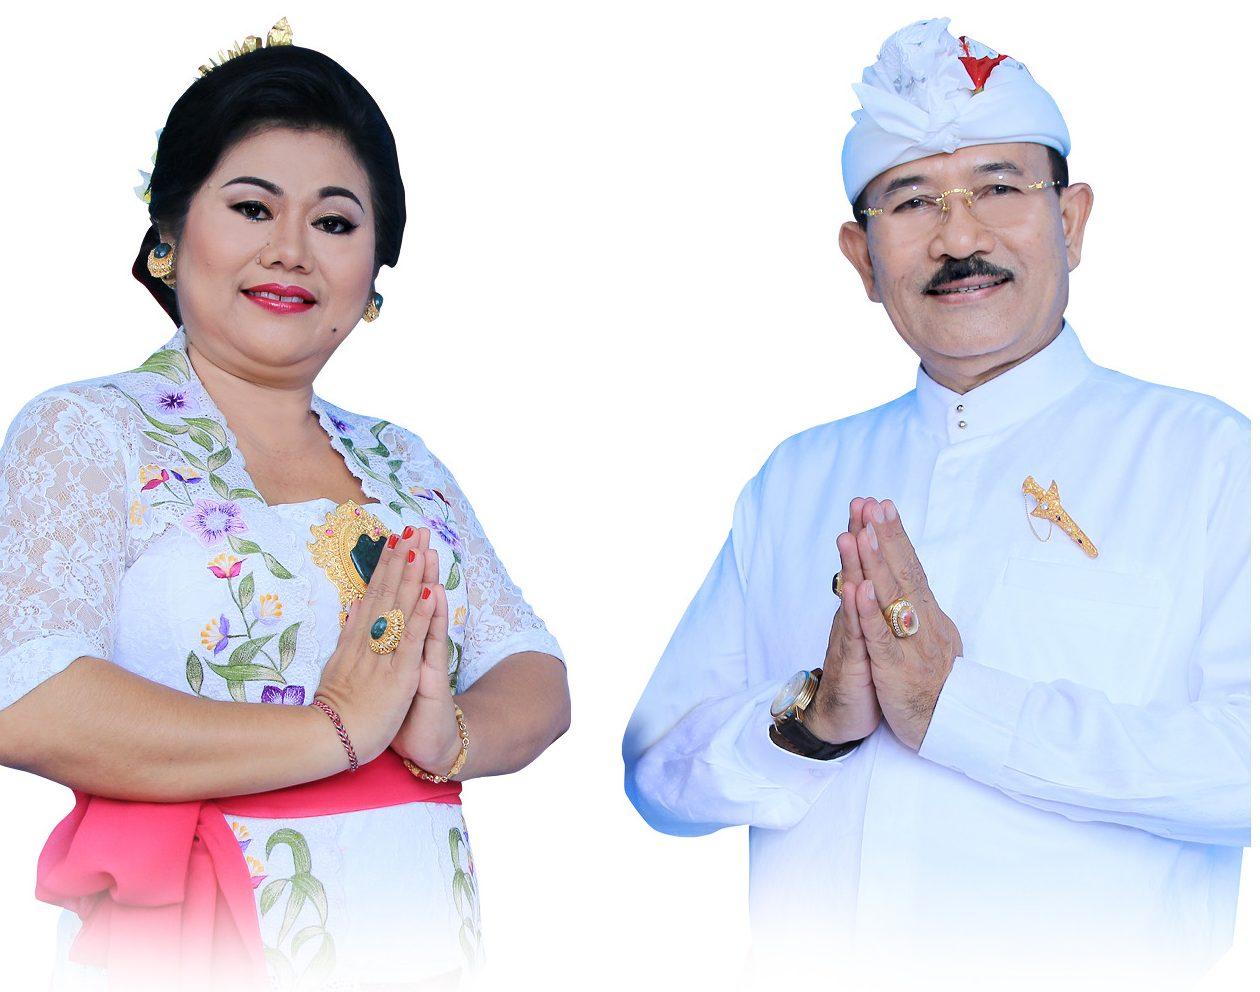 BUPATI Karangasem, IGA Mas Sumatri; bersama Wabup I Wayan Artha Dipa. Foto: ist